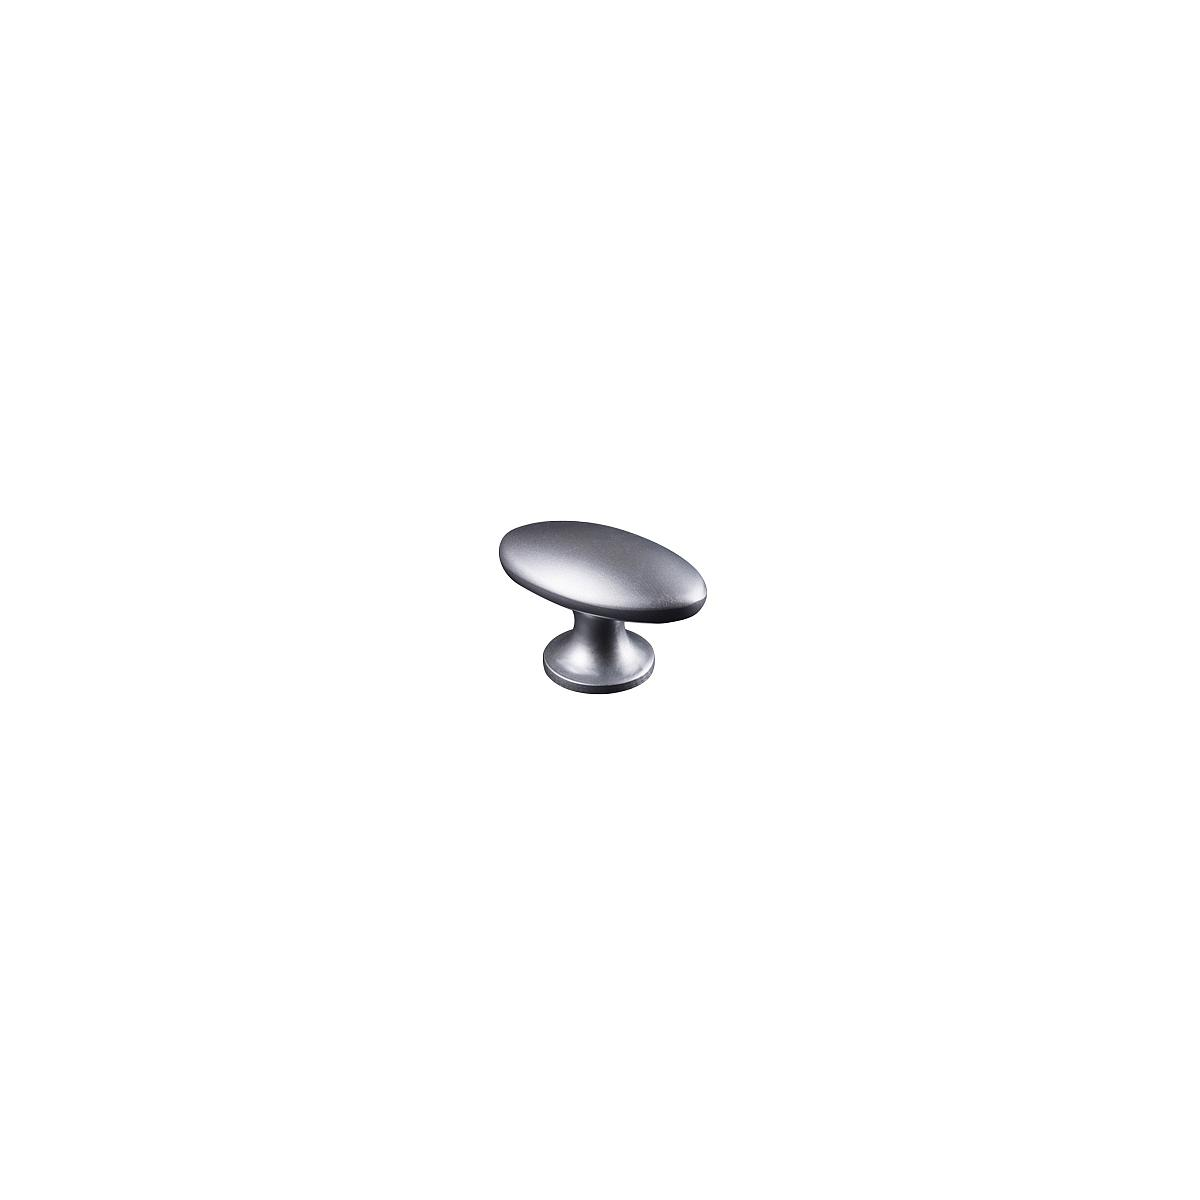 1 poignée armoire-commode-tiroir Lifetime ovale zinc